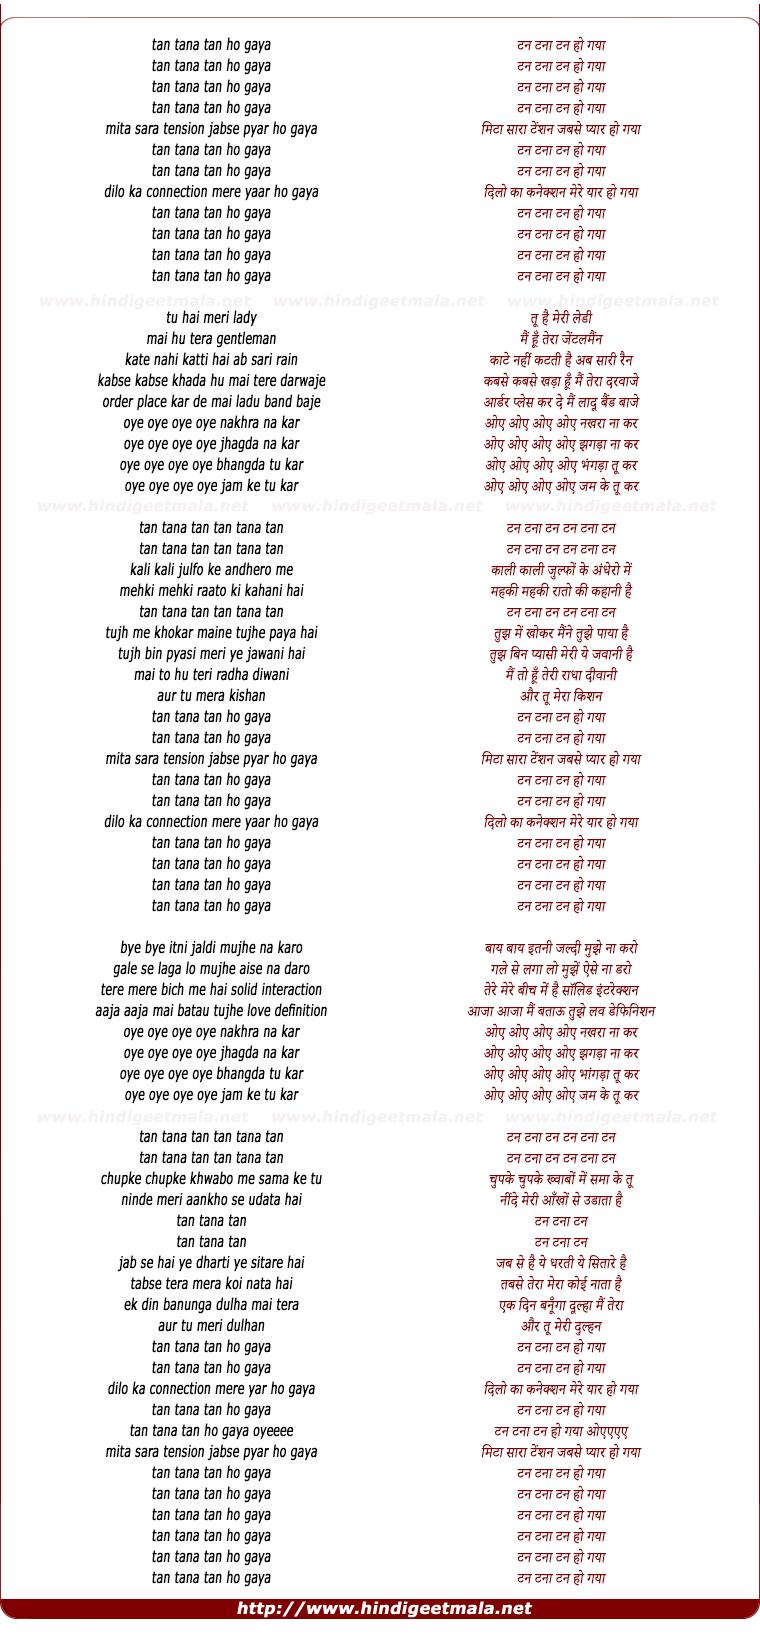 lyrics of song Tan Tana Tan Ho Gaya